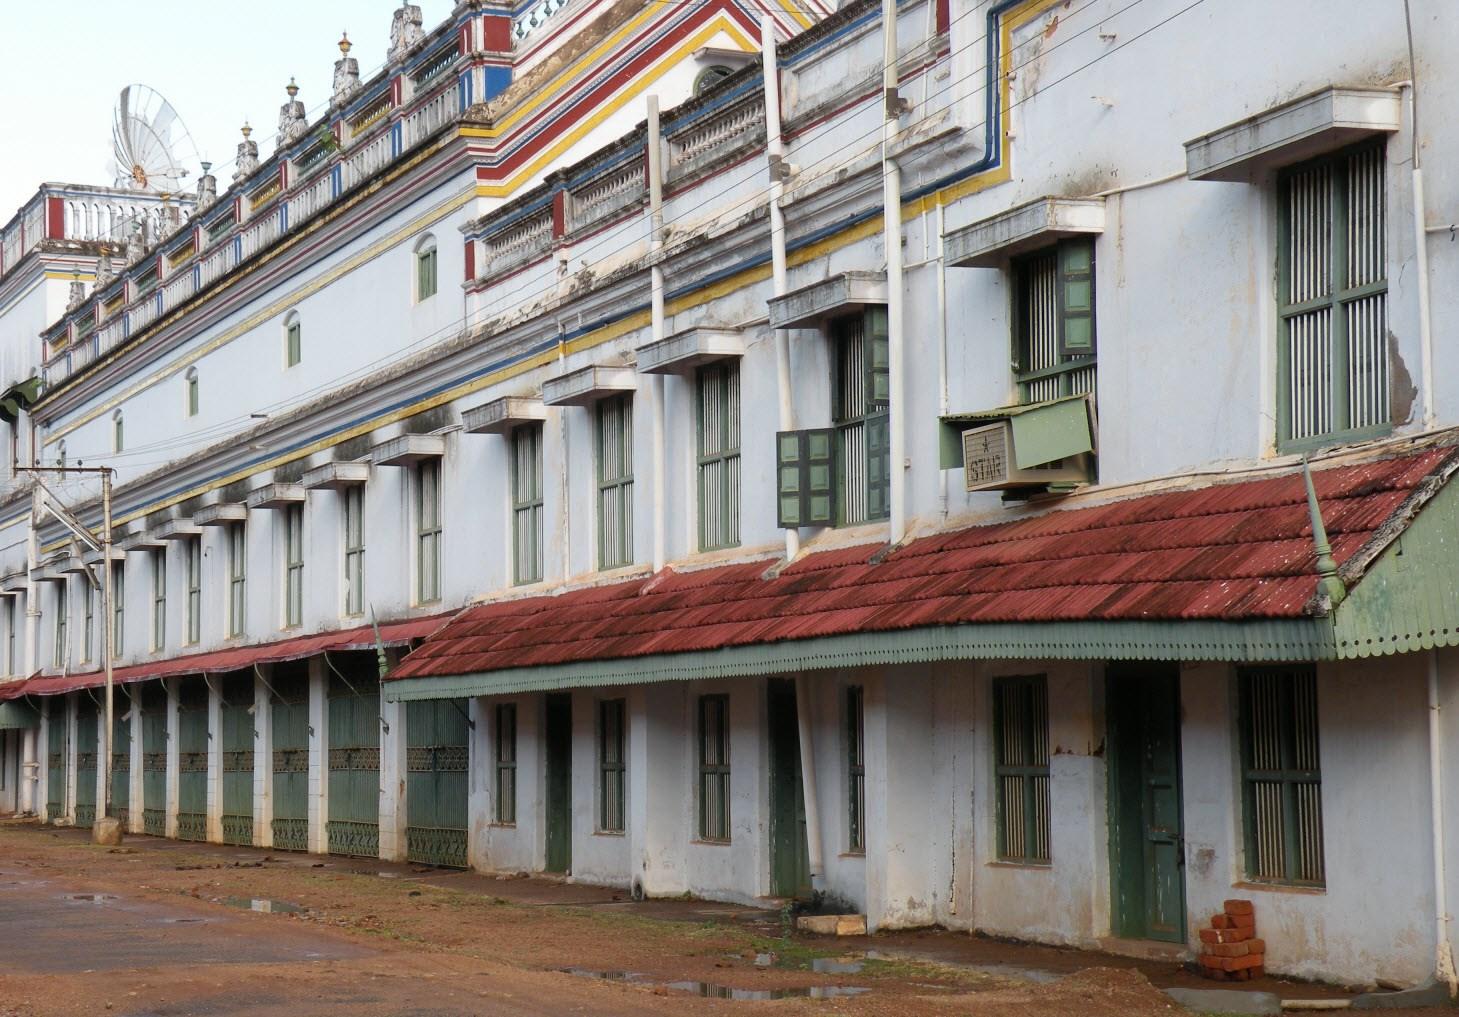 Tamilnadu Tourism: Chettiar Palace, Kanadukathan, Sivaganga